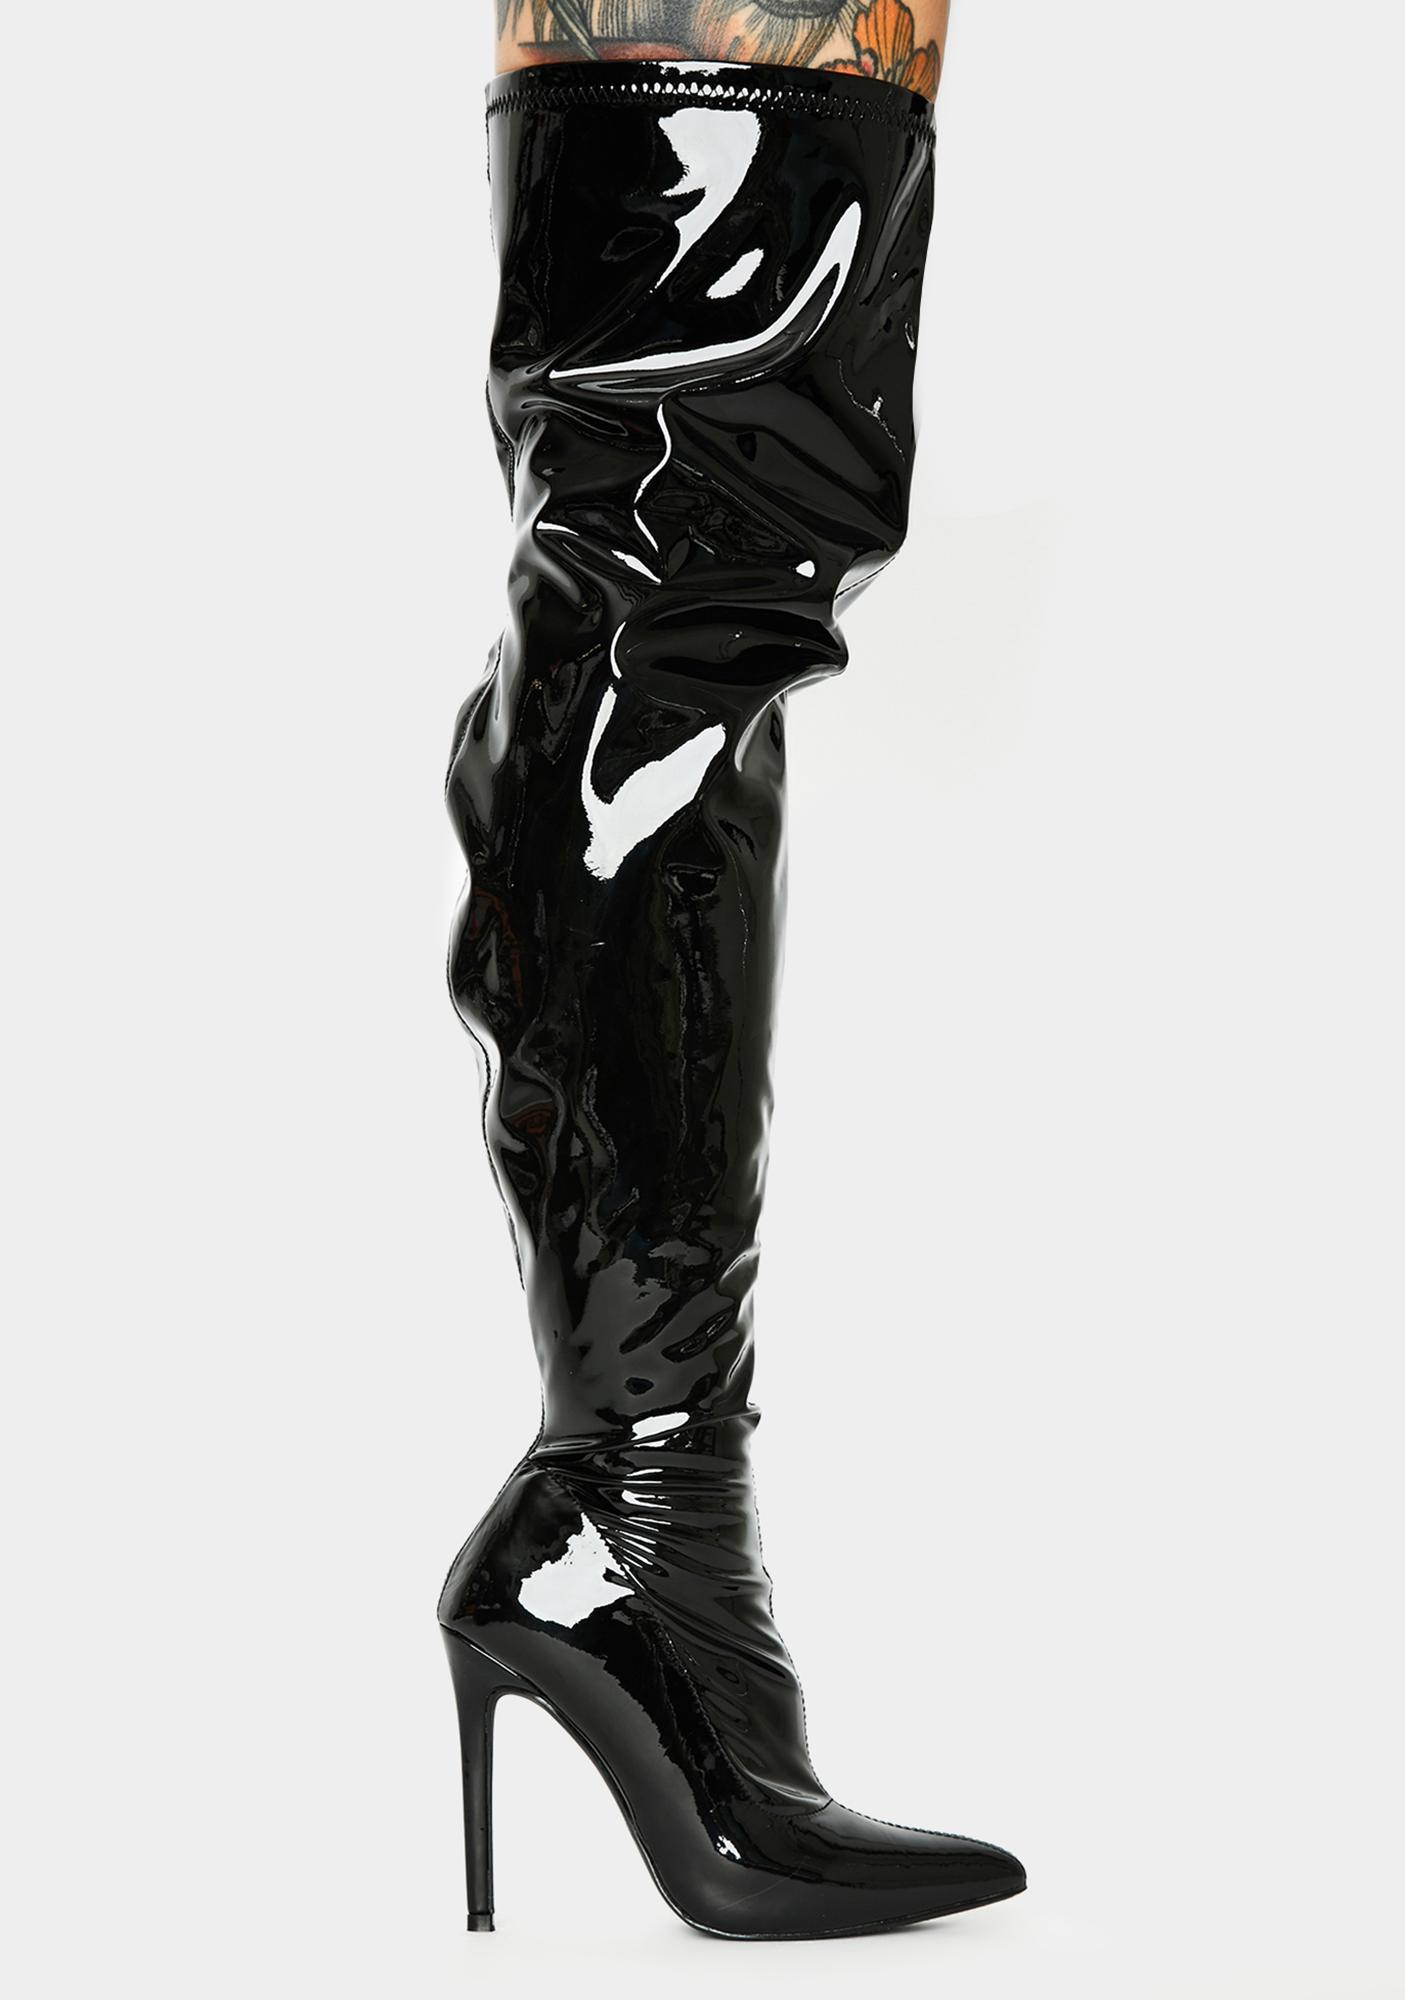 Vinyl Thigh High Stiletto Boots Black